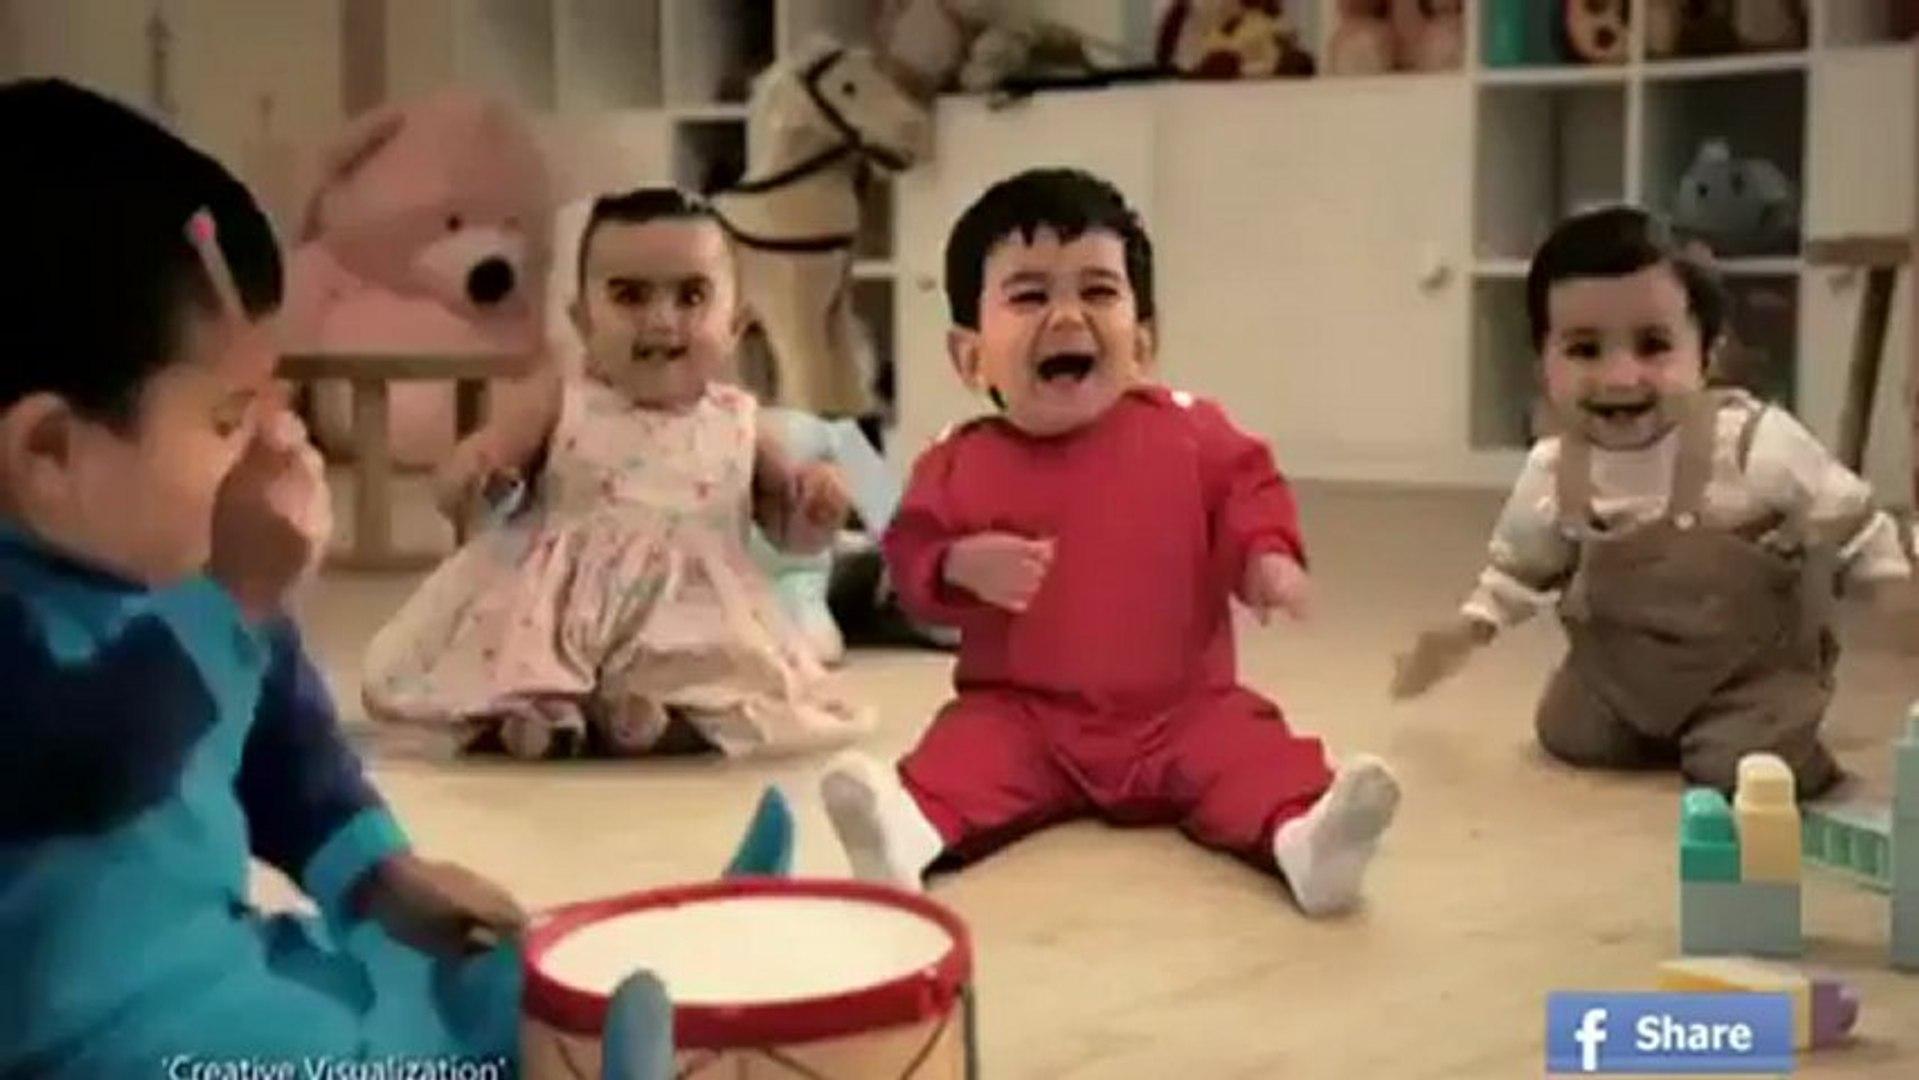 Kitkat kids dancing funny Tv commercial